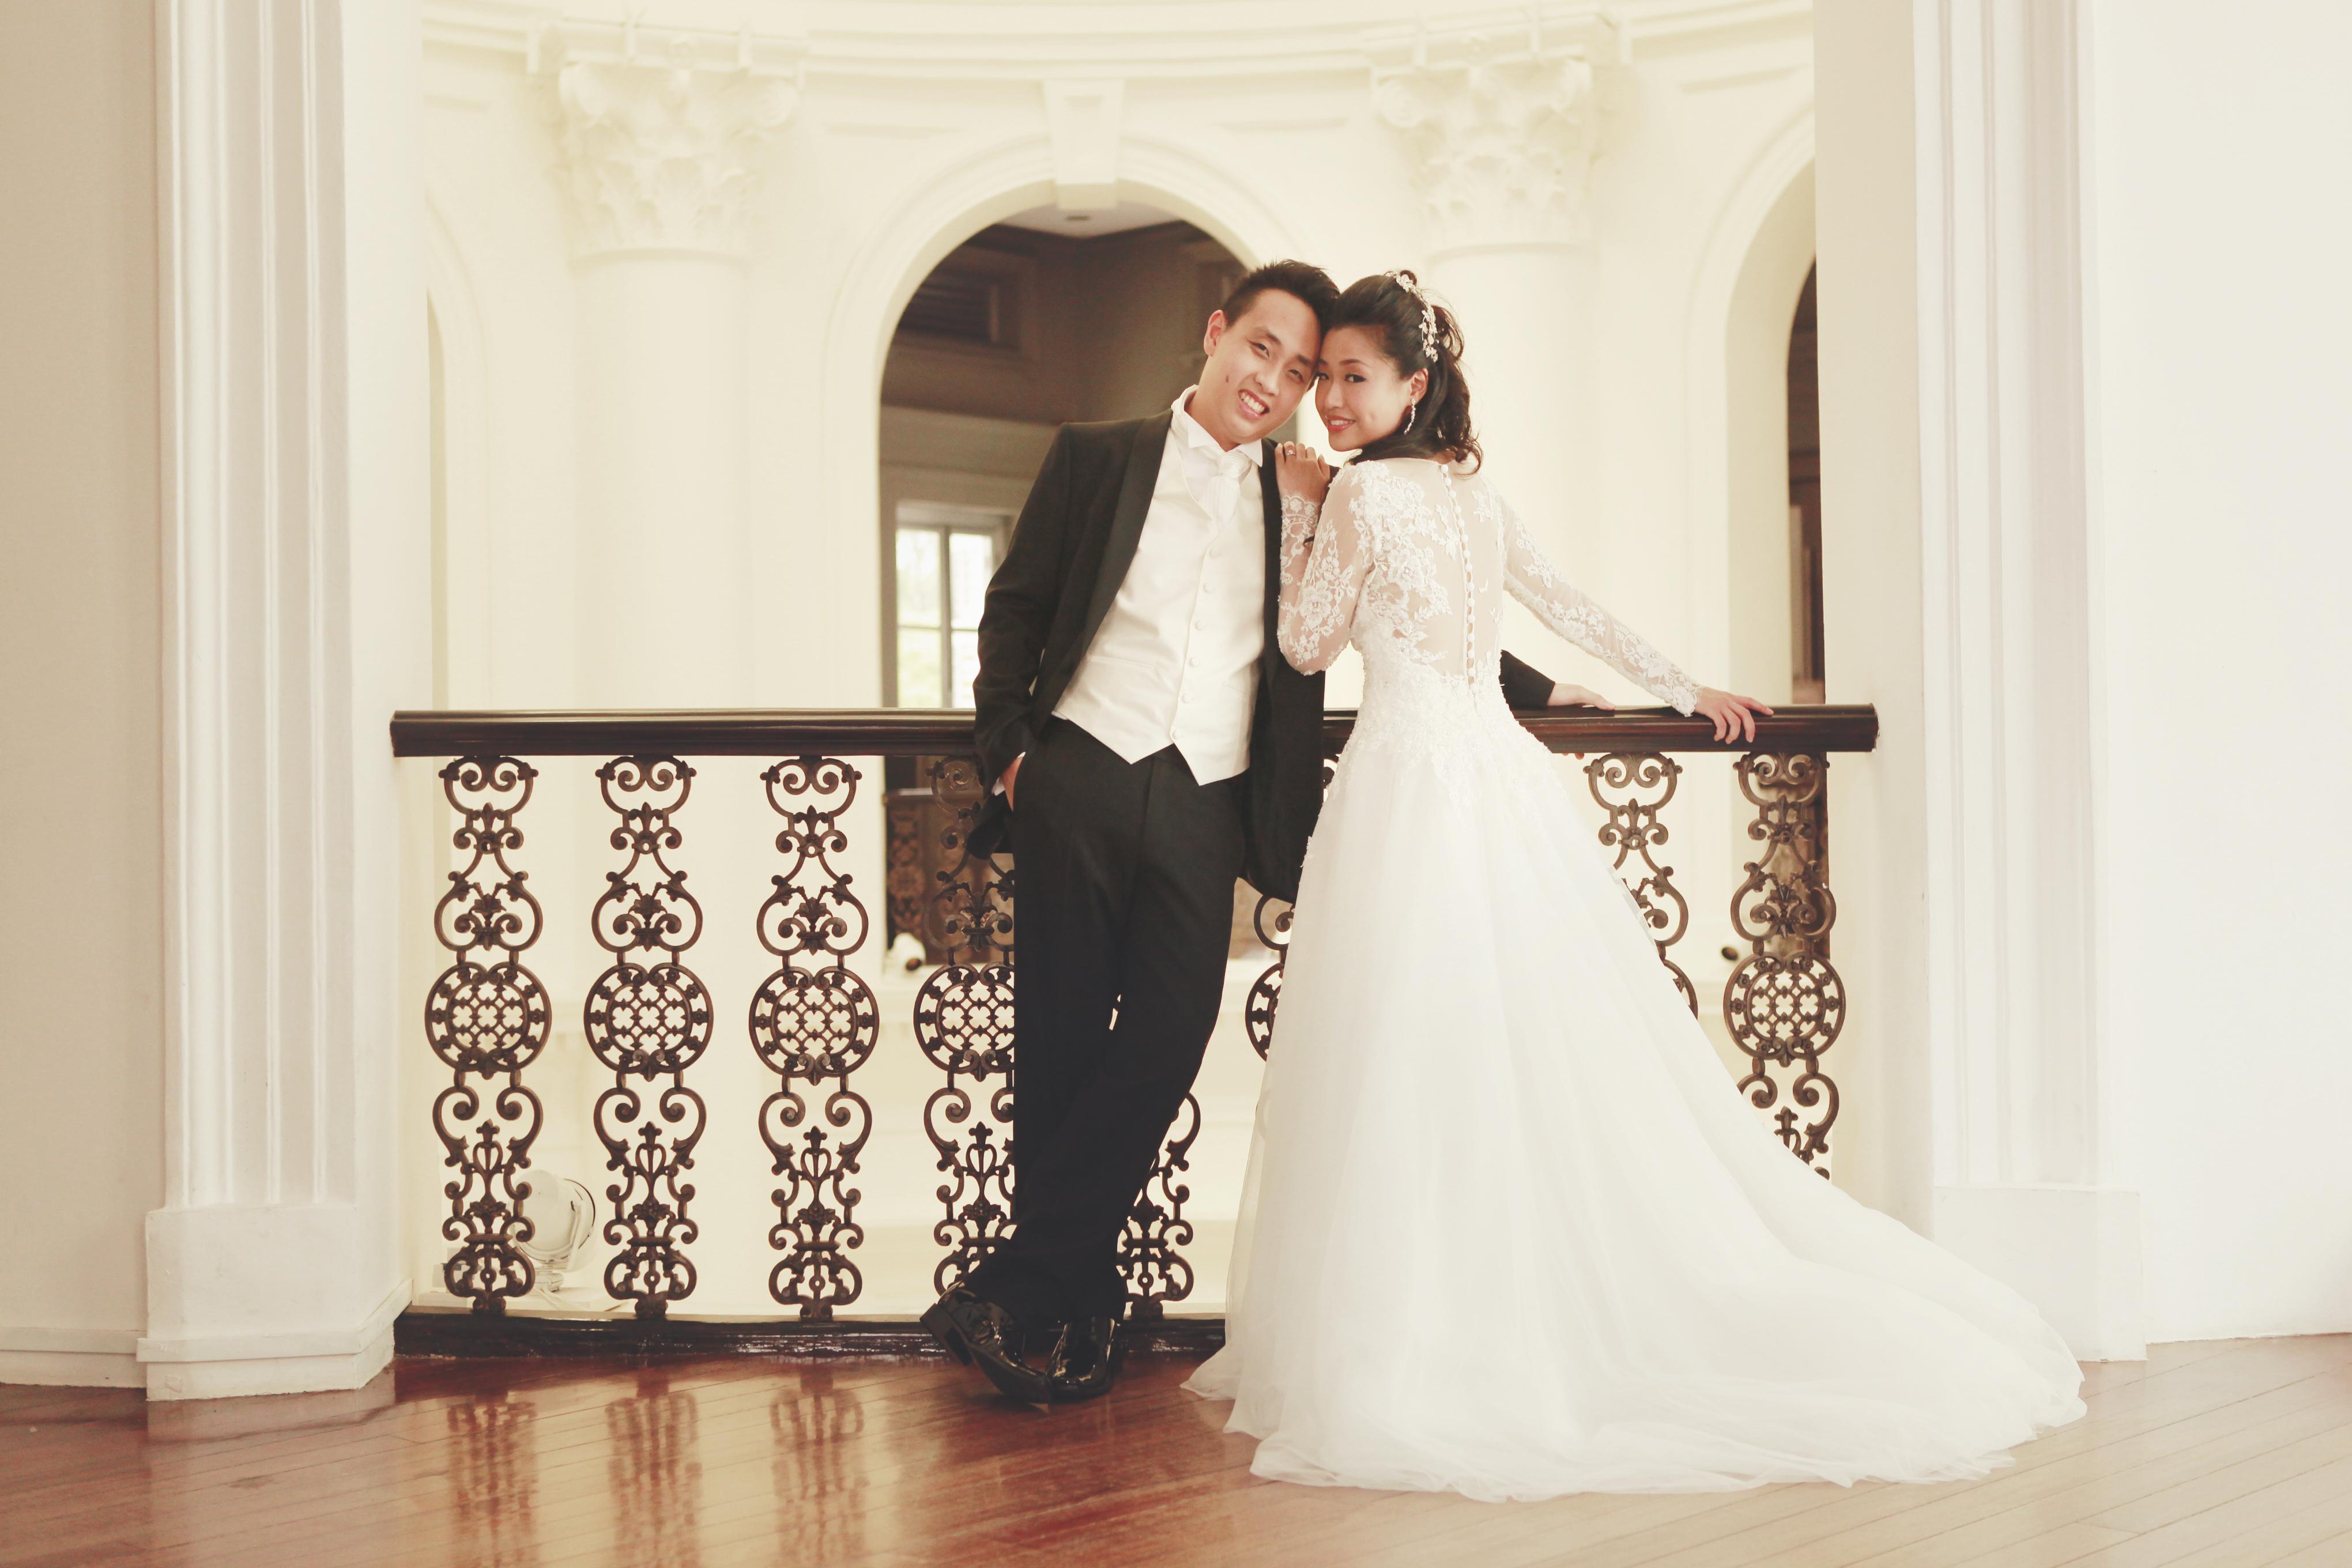 Elaine teoh wedding